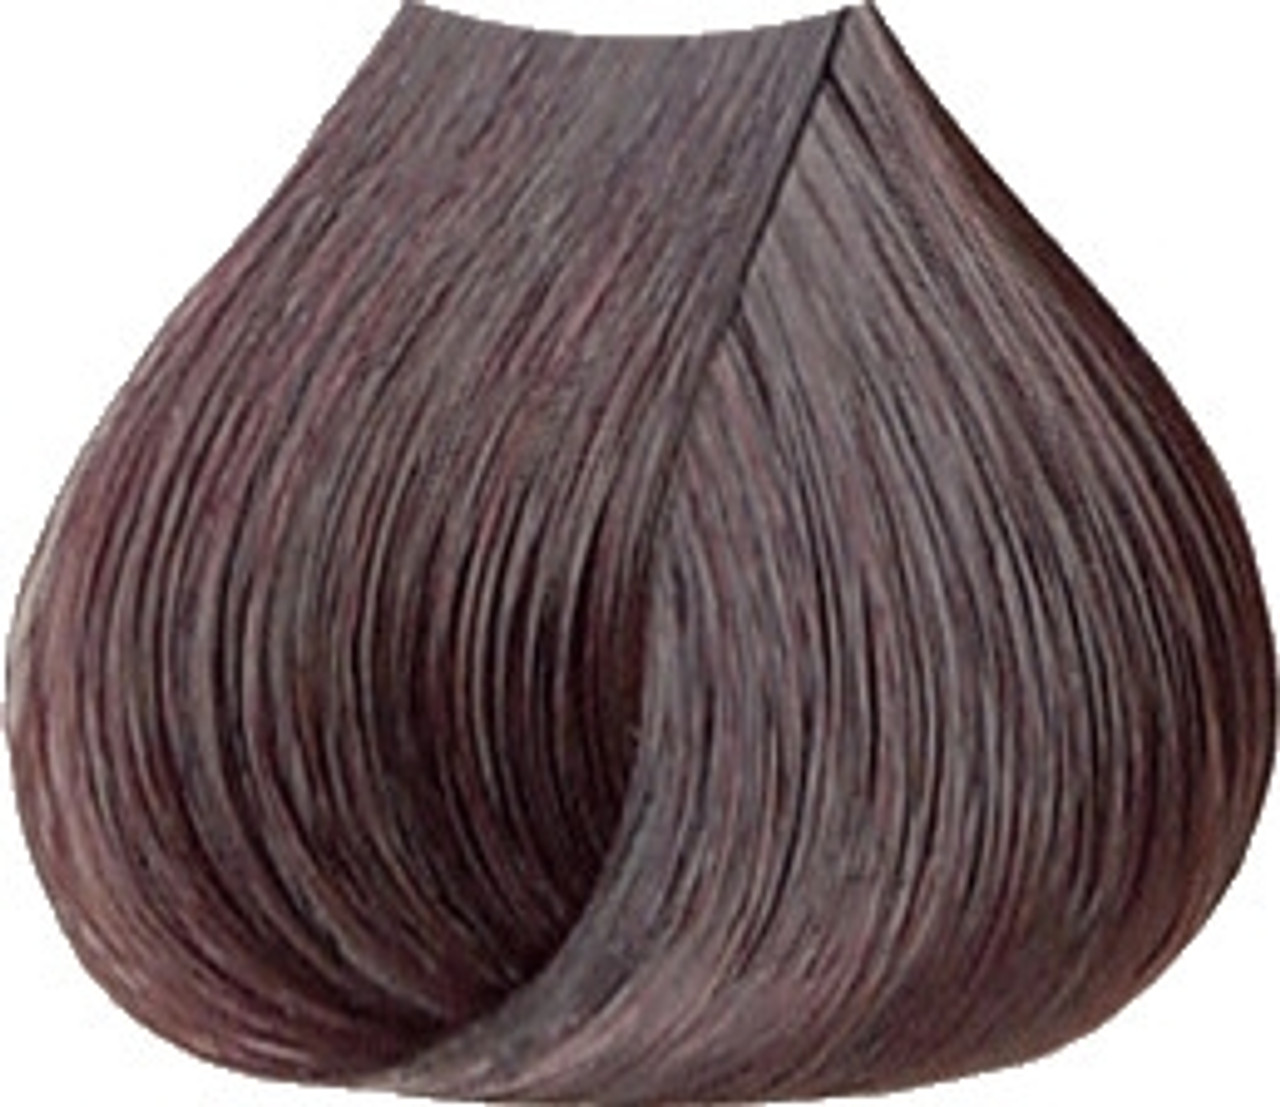 Satin Hair Color - Mocha - 5Mocha Light Mocha Brown